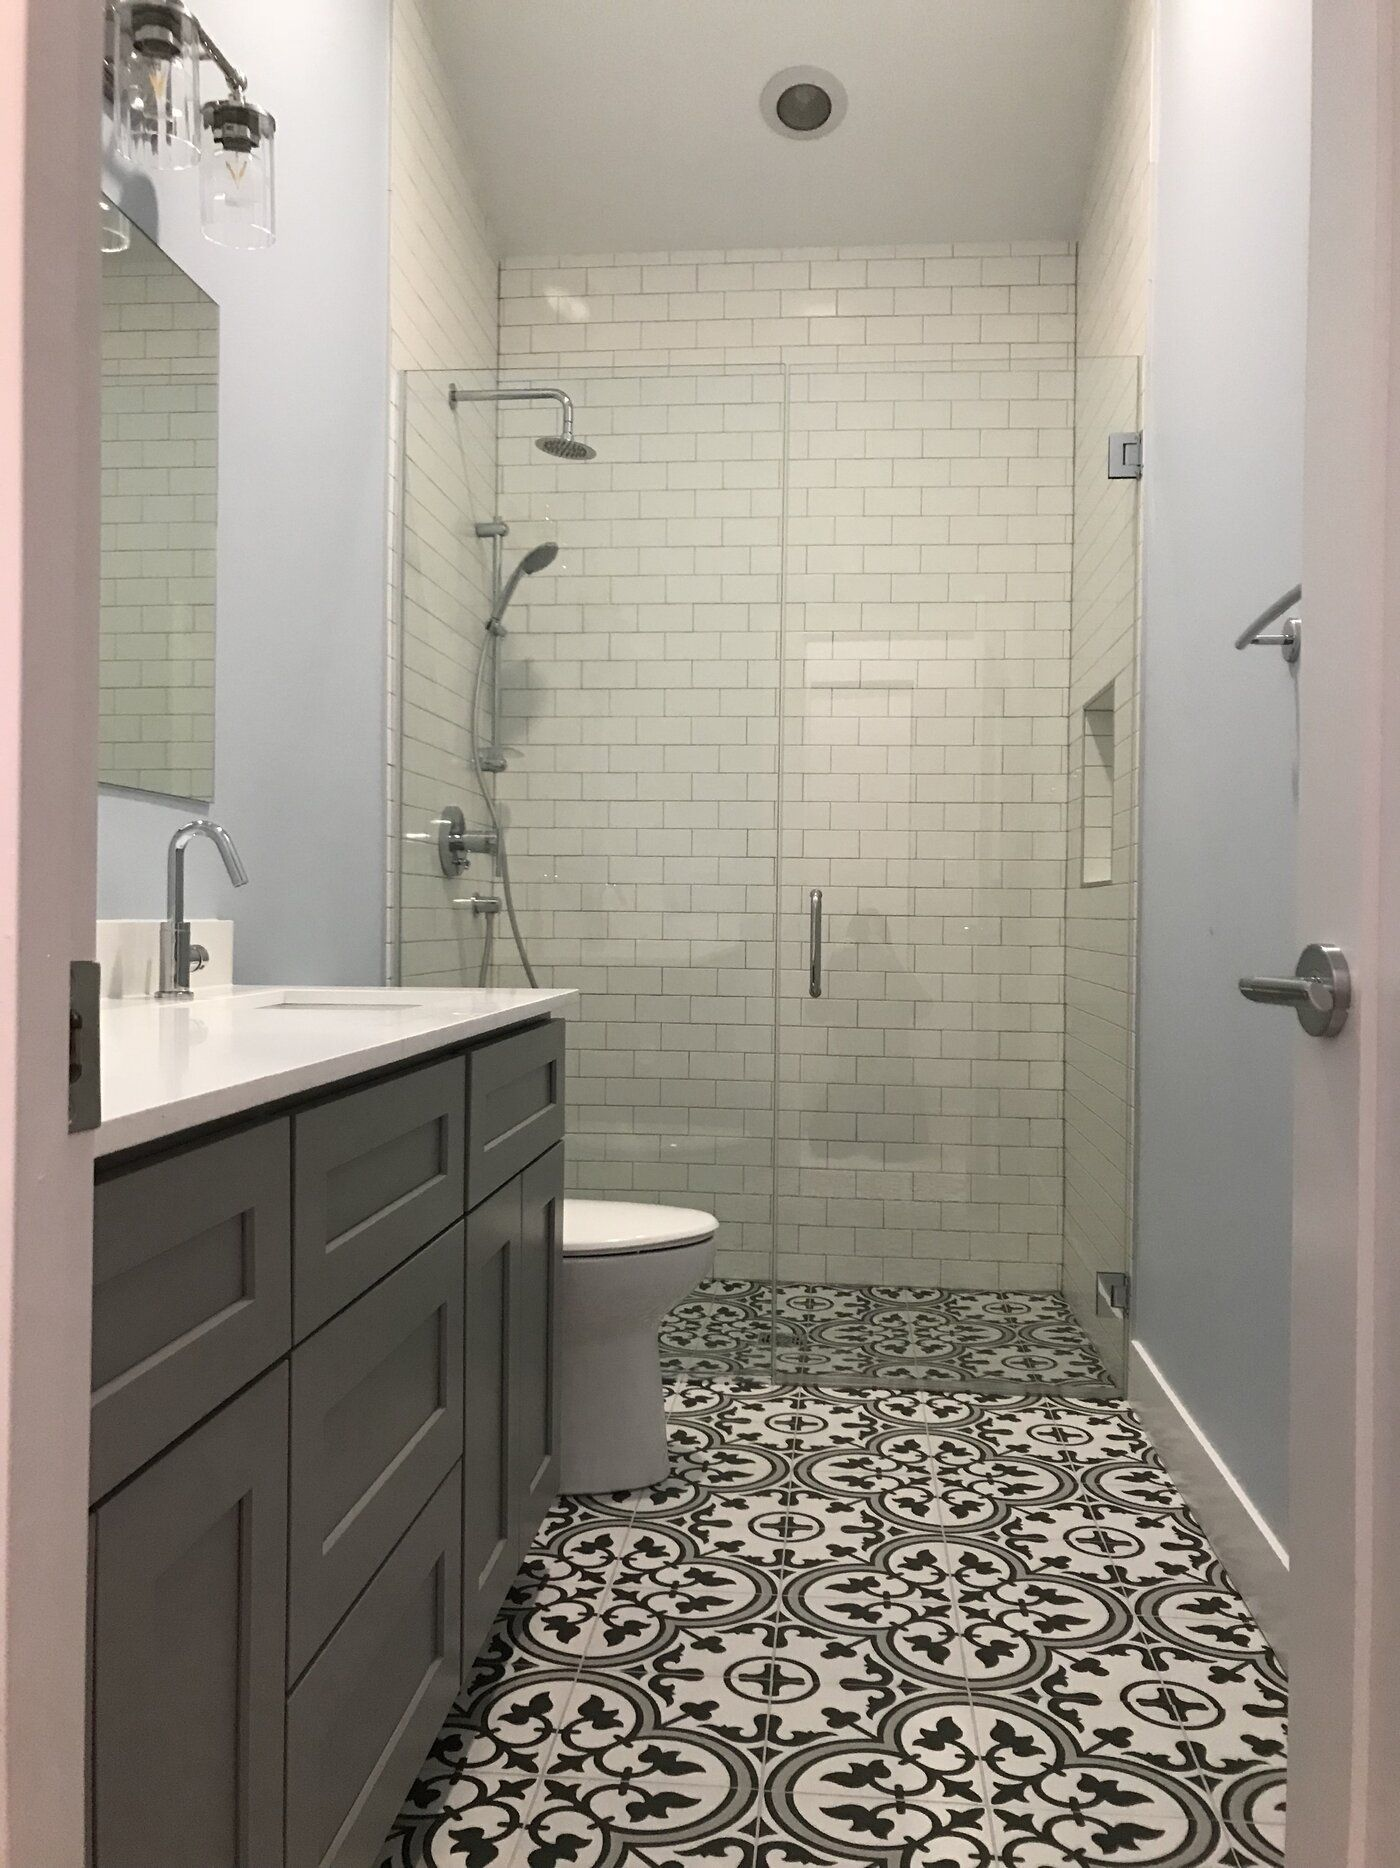 "Artea 5"" x 5"" Porcelain Patterned Wall & Floor Tile  Bathrooms"